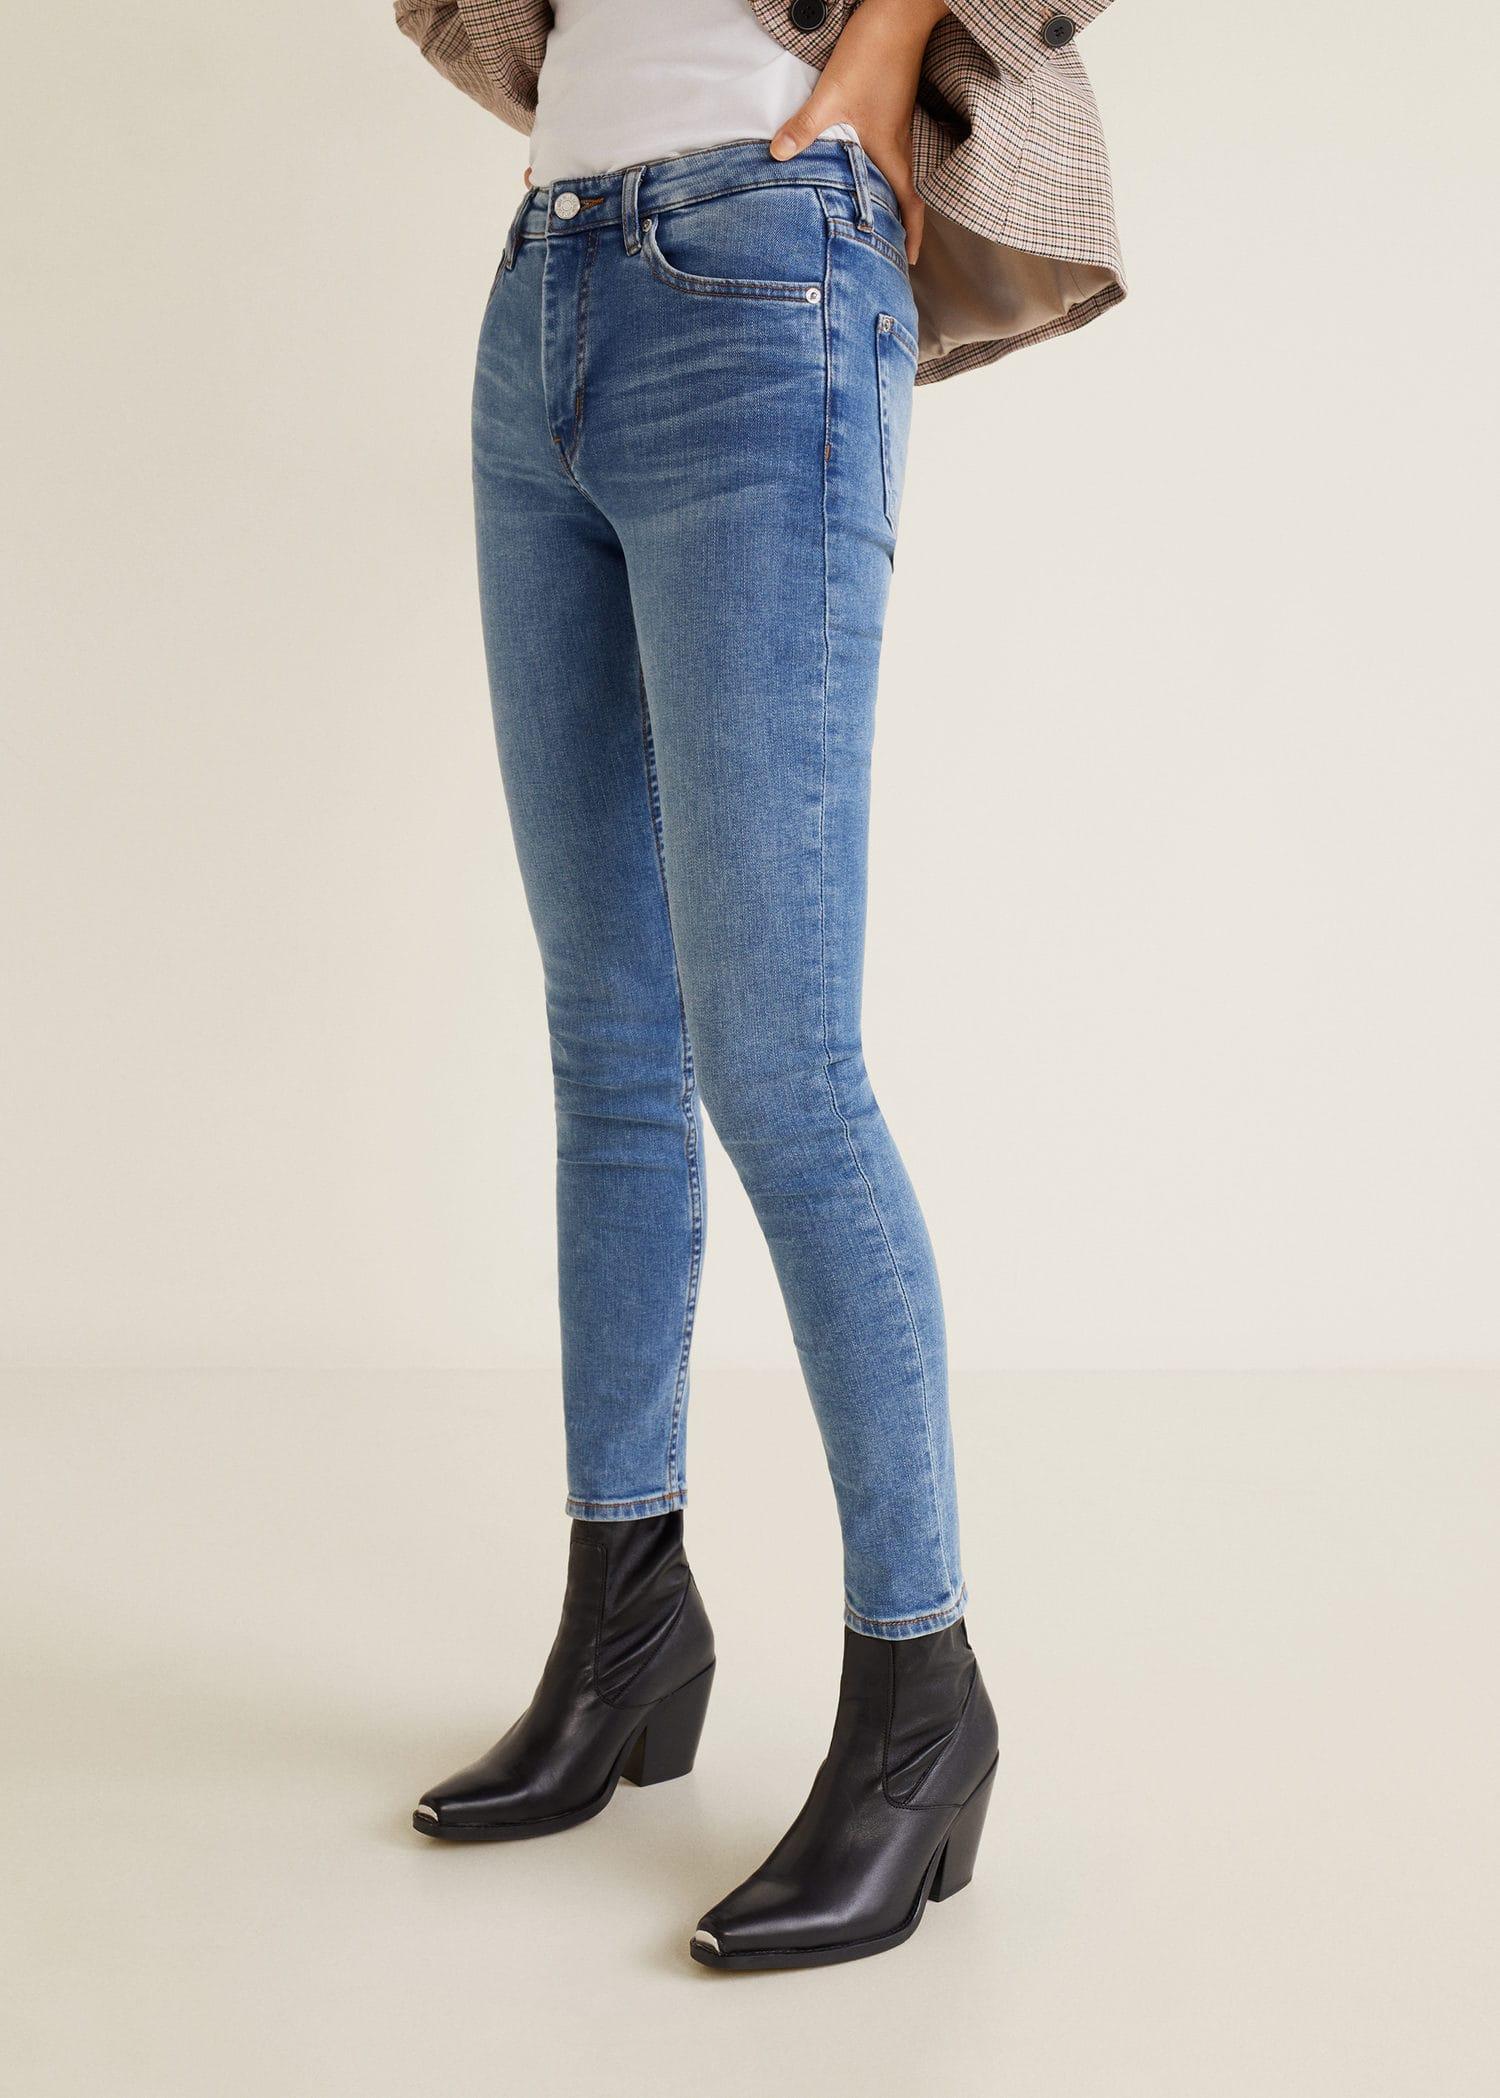 Jean skinny olivia Femme | Mango France